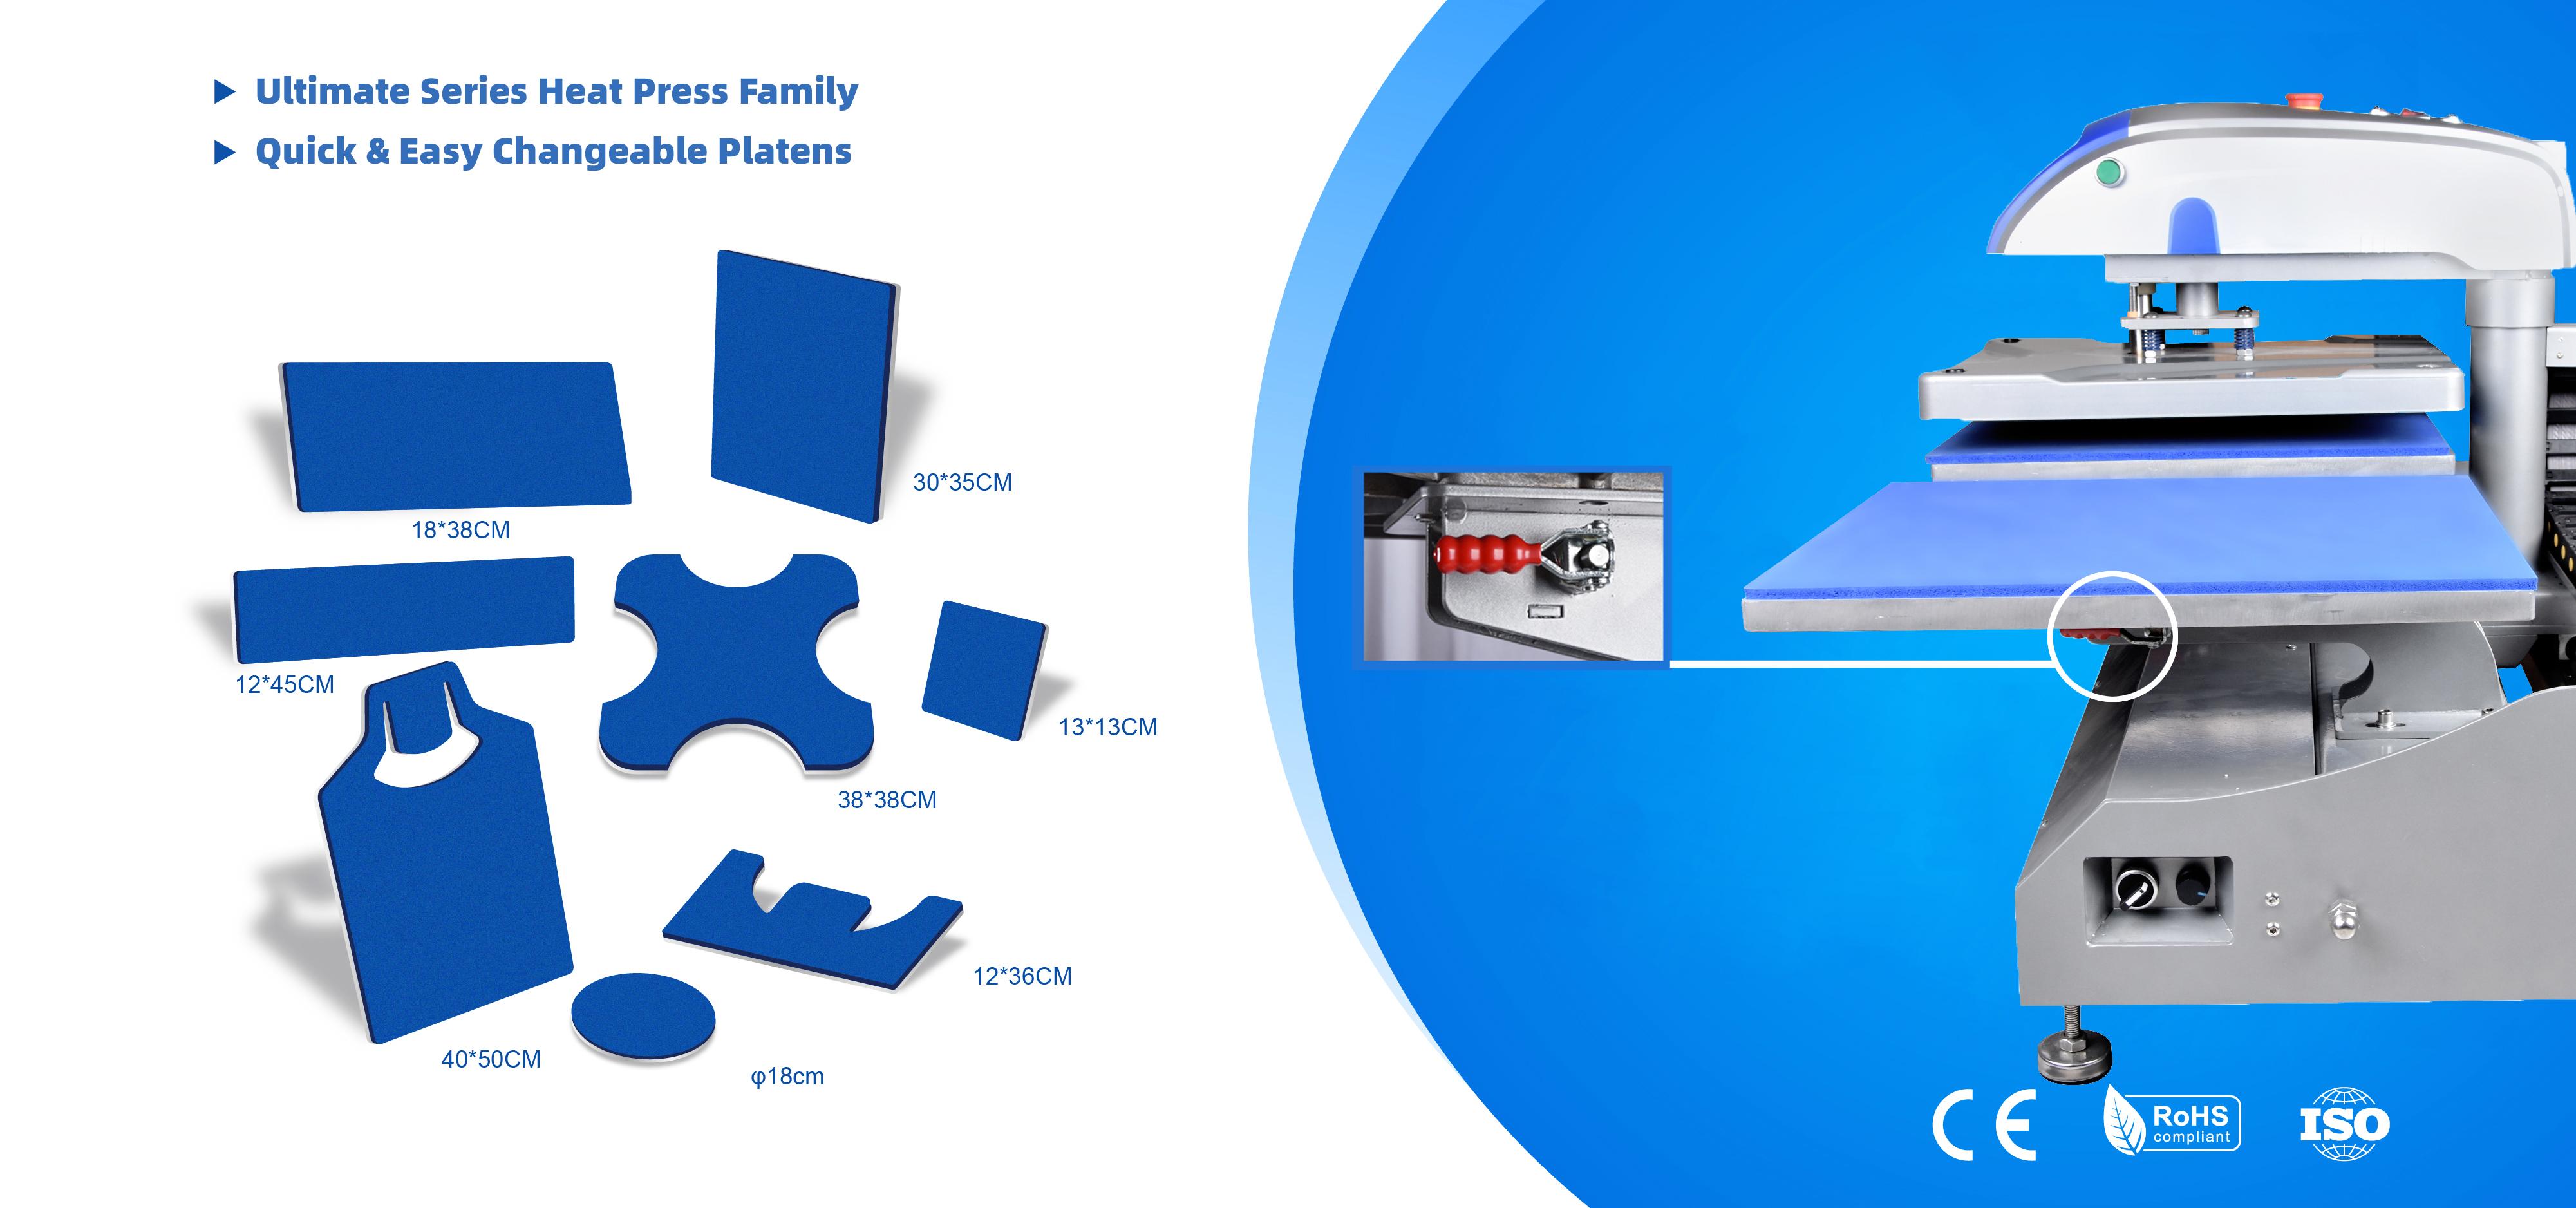 https://www.xheatpress.com/2019-prime-dual-plates-shuttle-electric-heat-transfer-printing-machine-product/